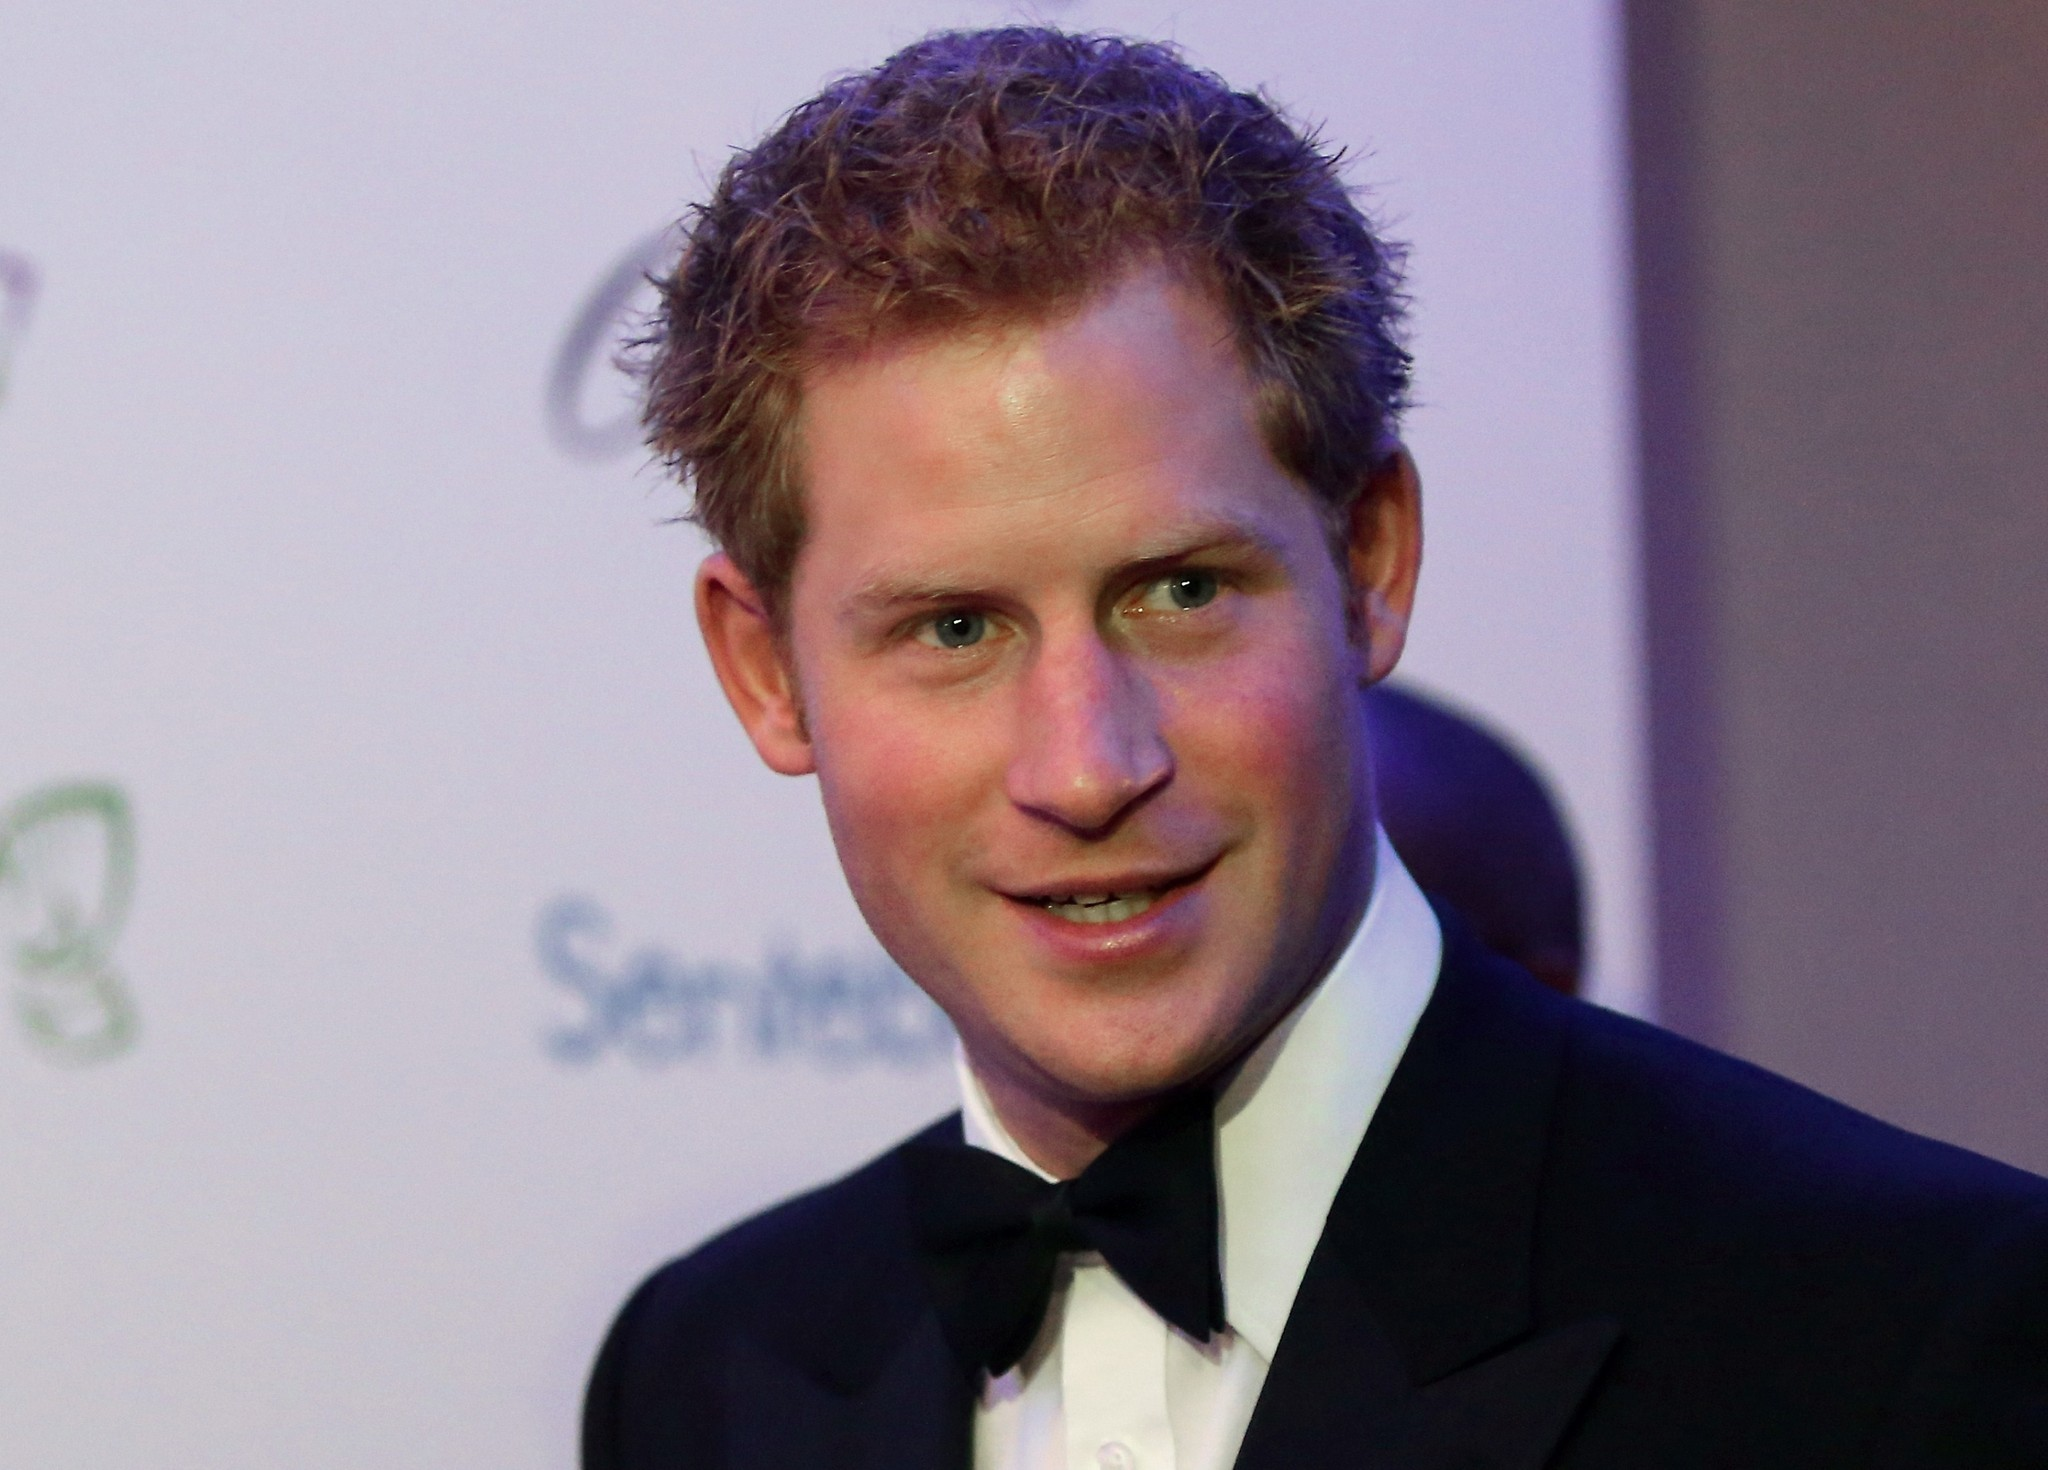 Prince Harry's romance heats up; do we hear royal wedding ...